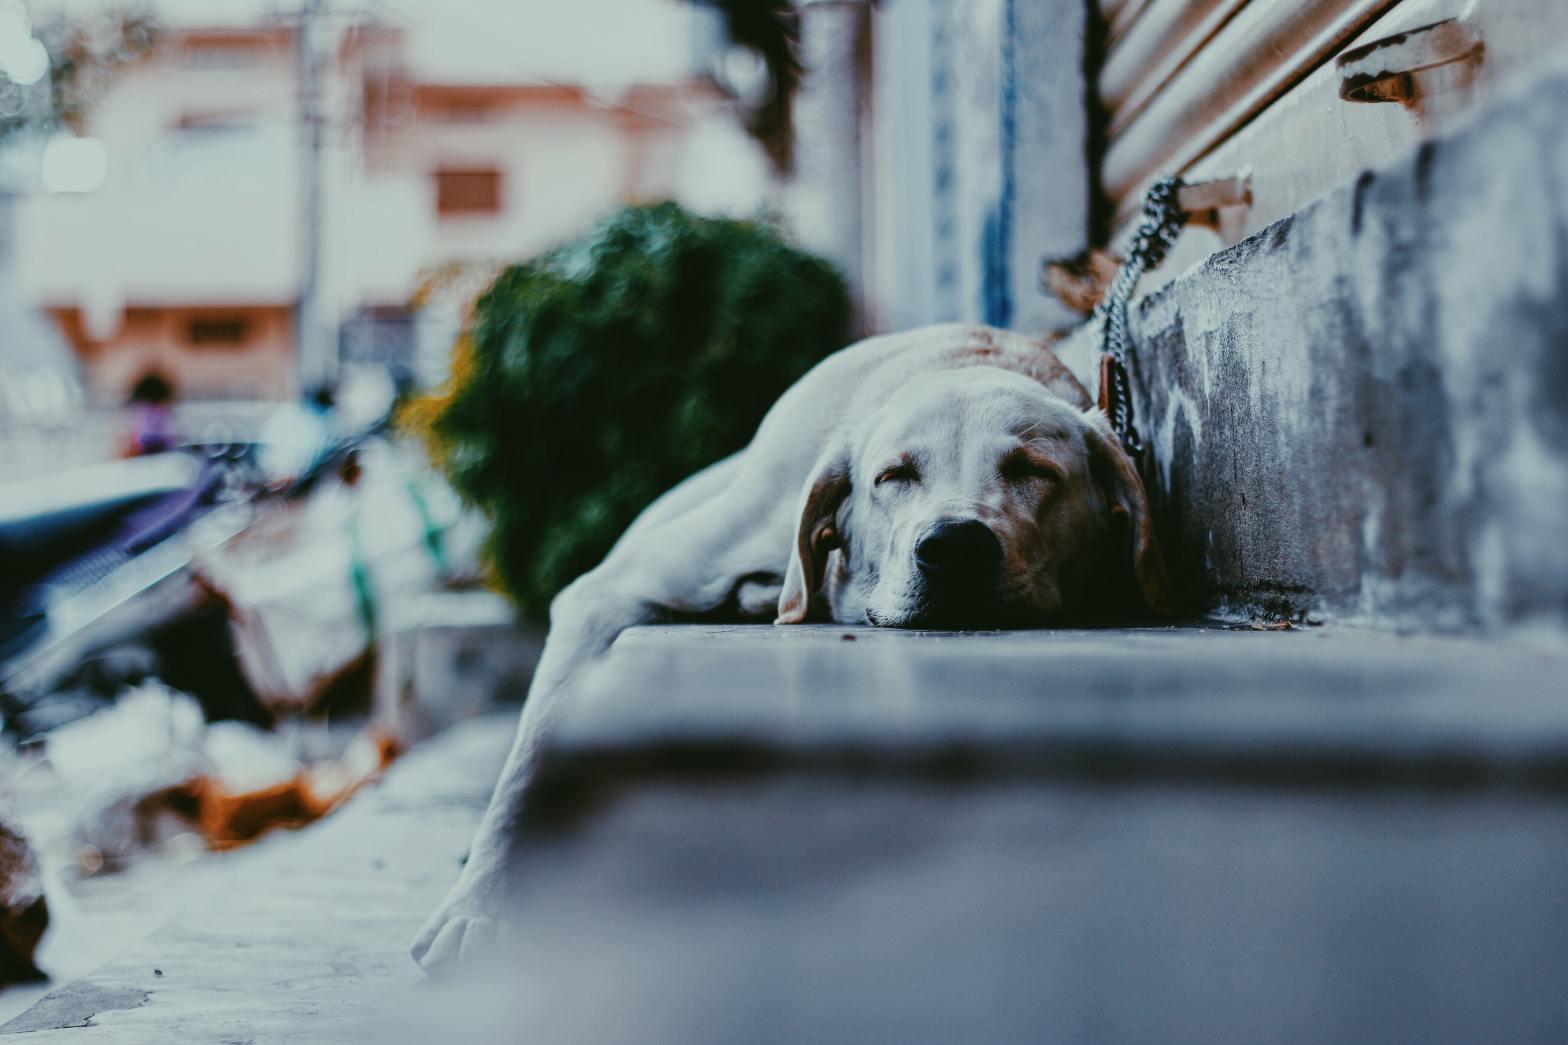 adult yellow labrador retriever sleeping on the street Photo by Sashank Saye on Unsplash